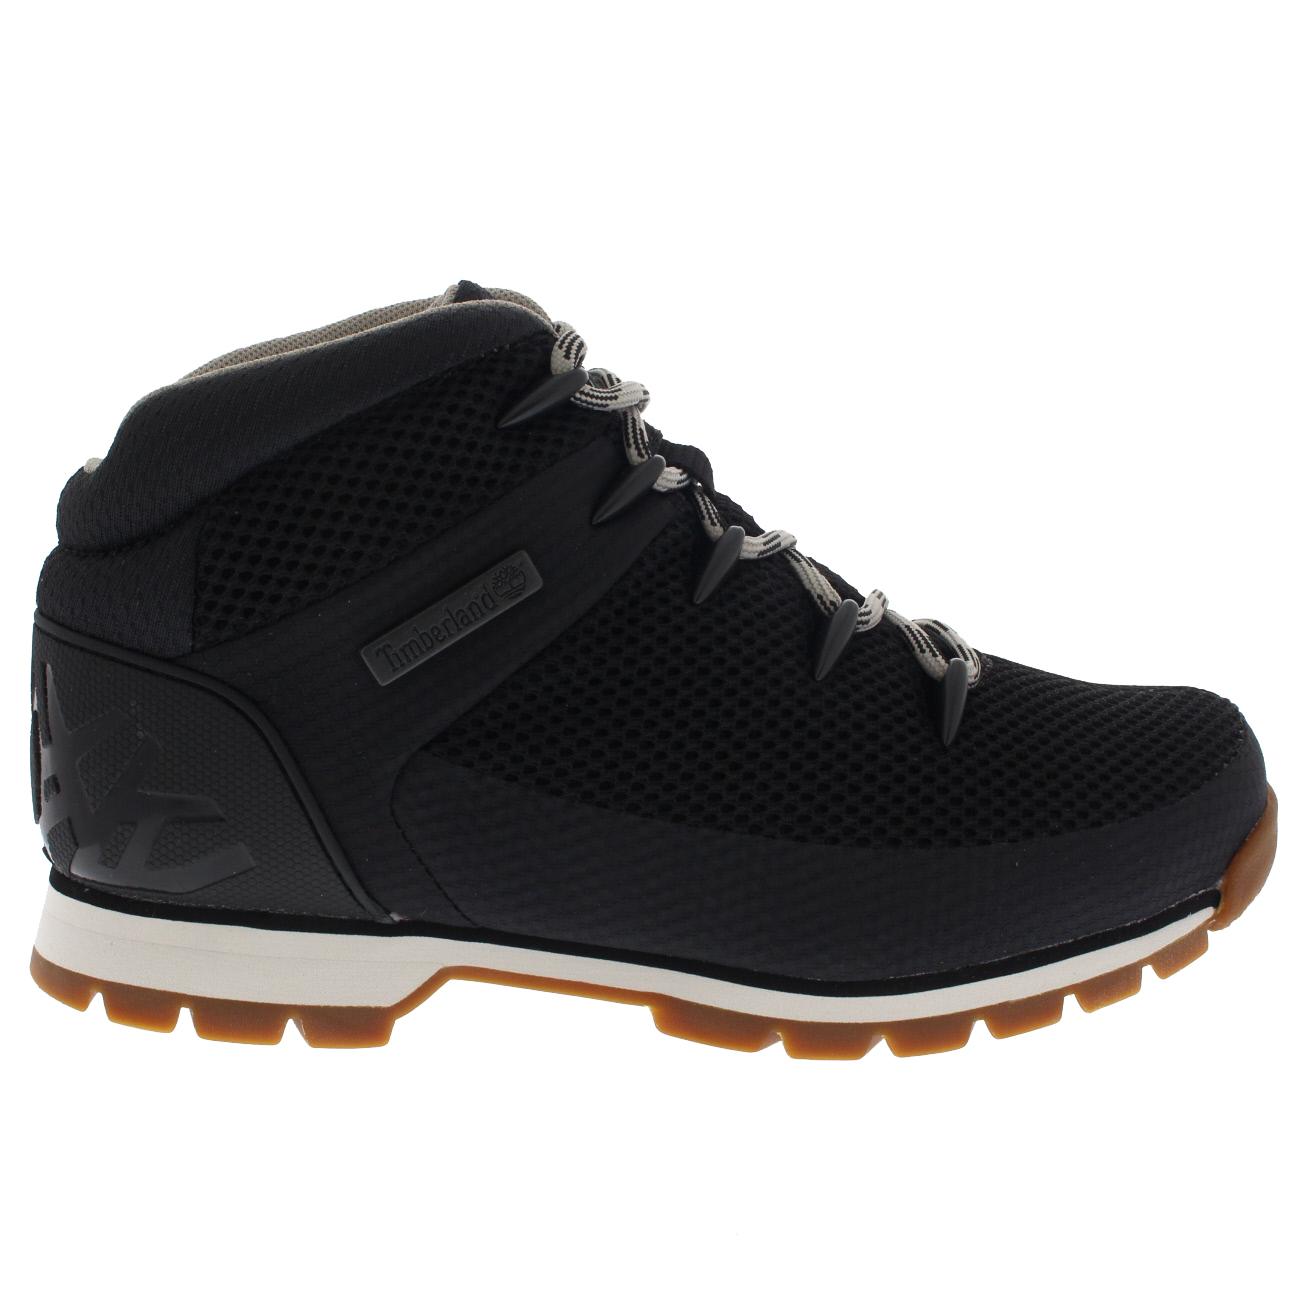 Mens-Timberland-Euro-Sprint-Fabric-Walking-Durable-Hiking-